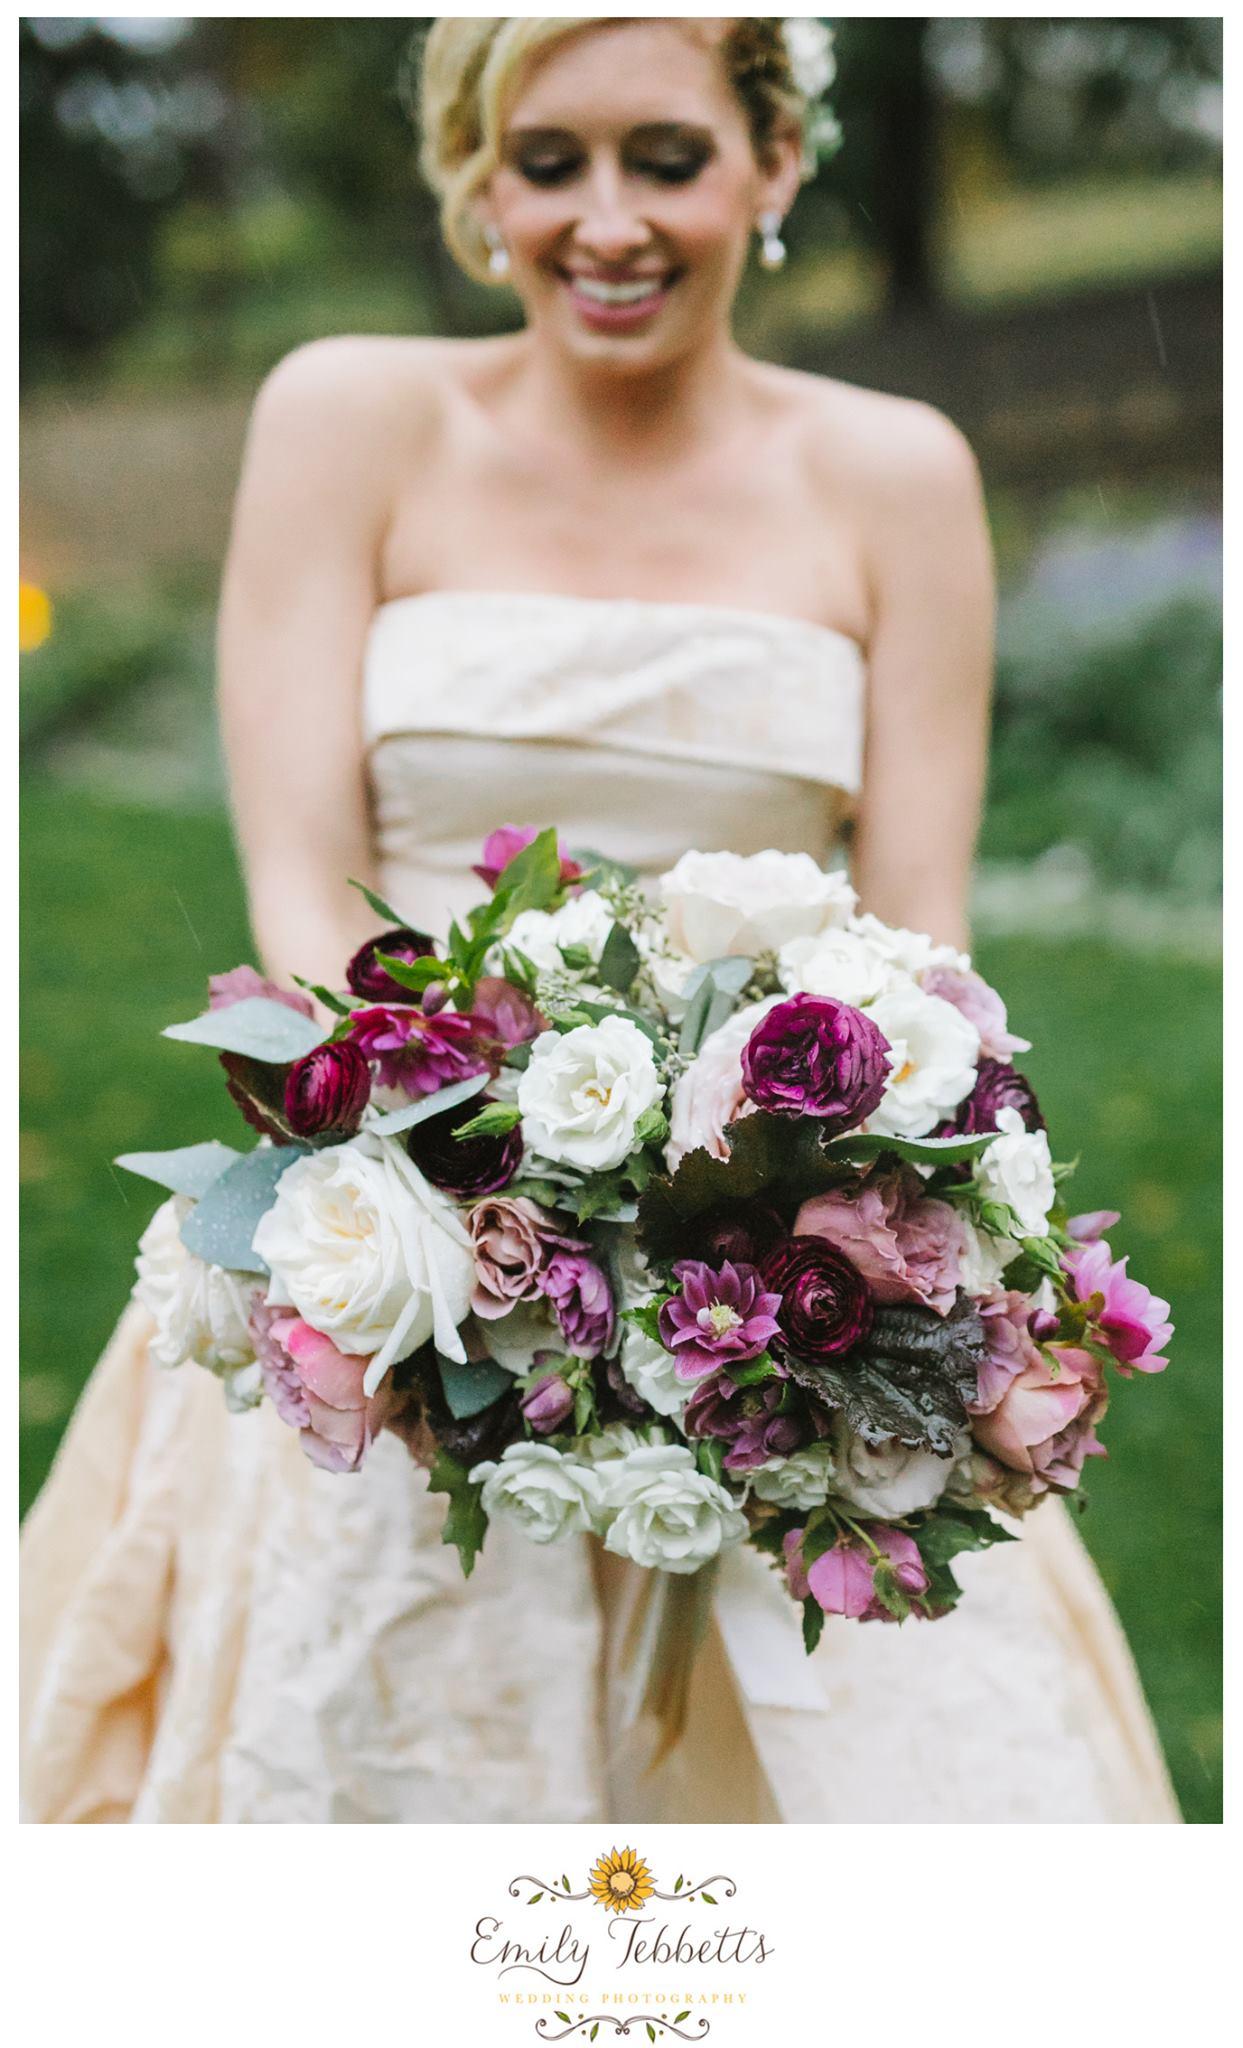 Crane Estate, Ipswich, MA - Emily Tebbetts Wedding Photography 4.jpg